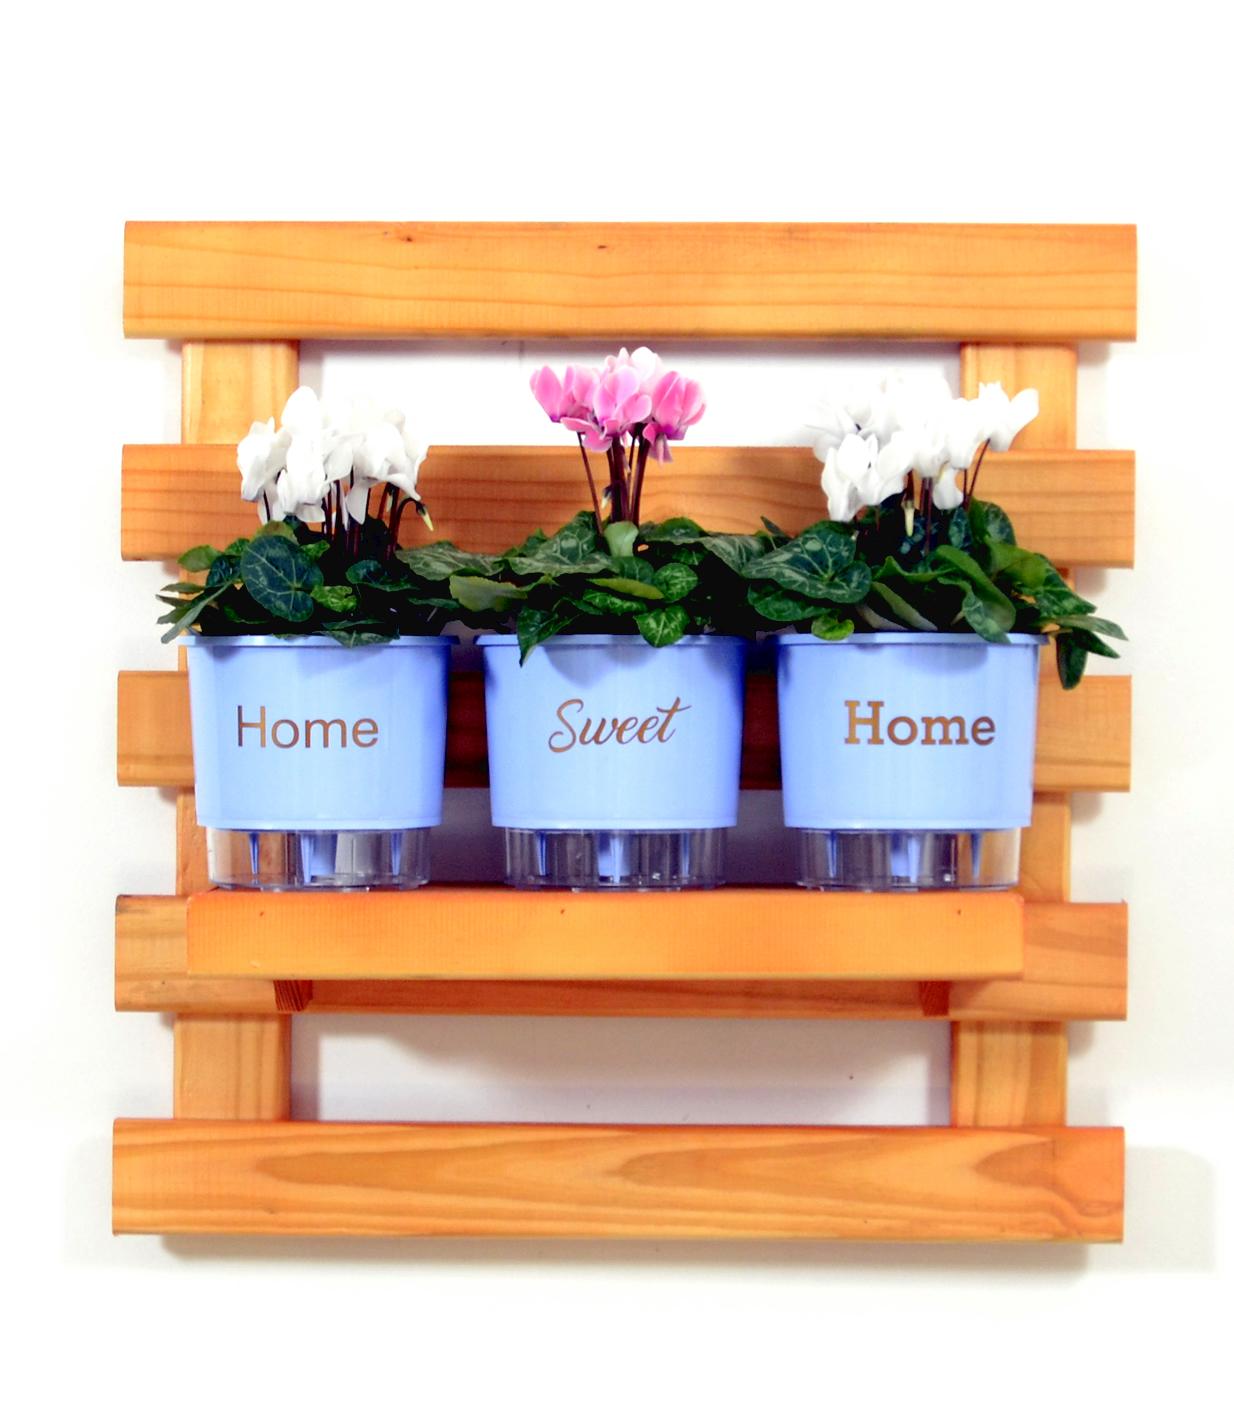 Horta vertical com vasos autoirrigáveis azuis